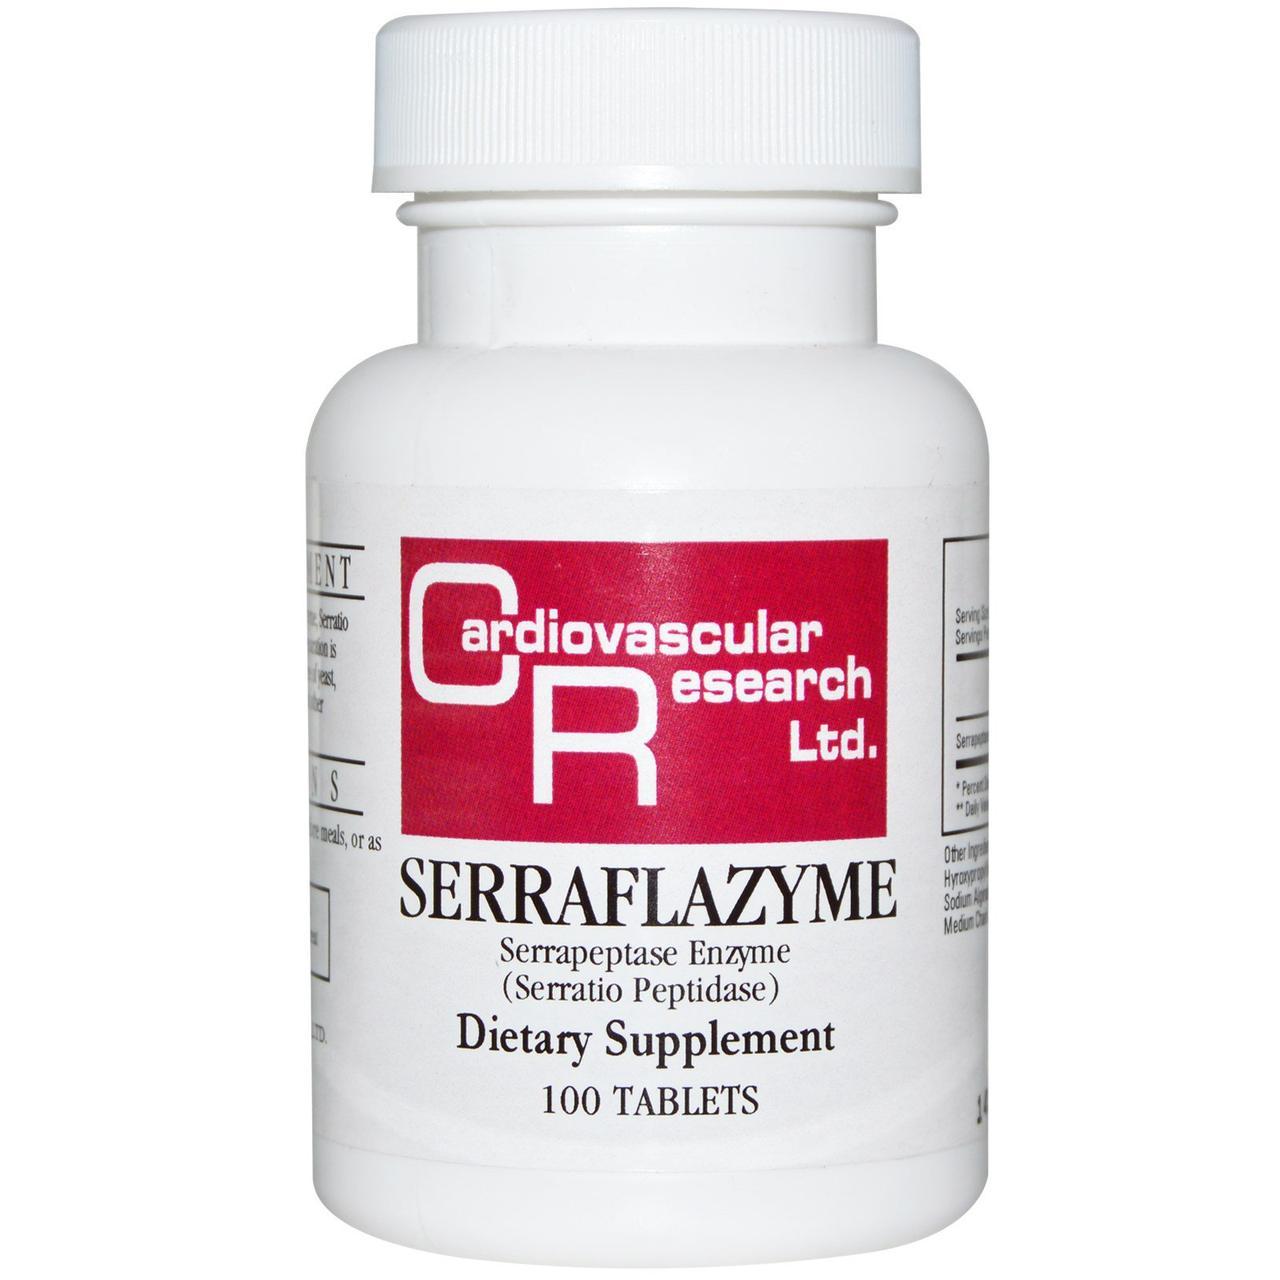 Серрафлазим, Cardiovascular Research Ltd., 100 таблеток.